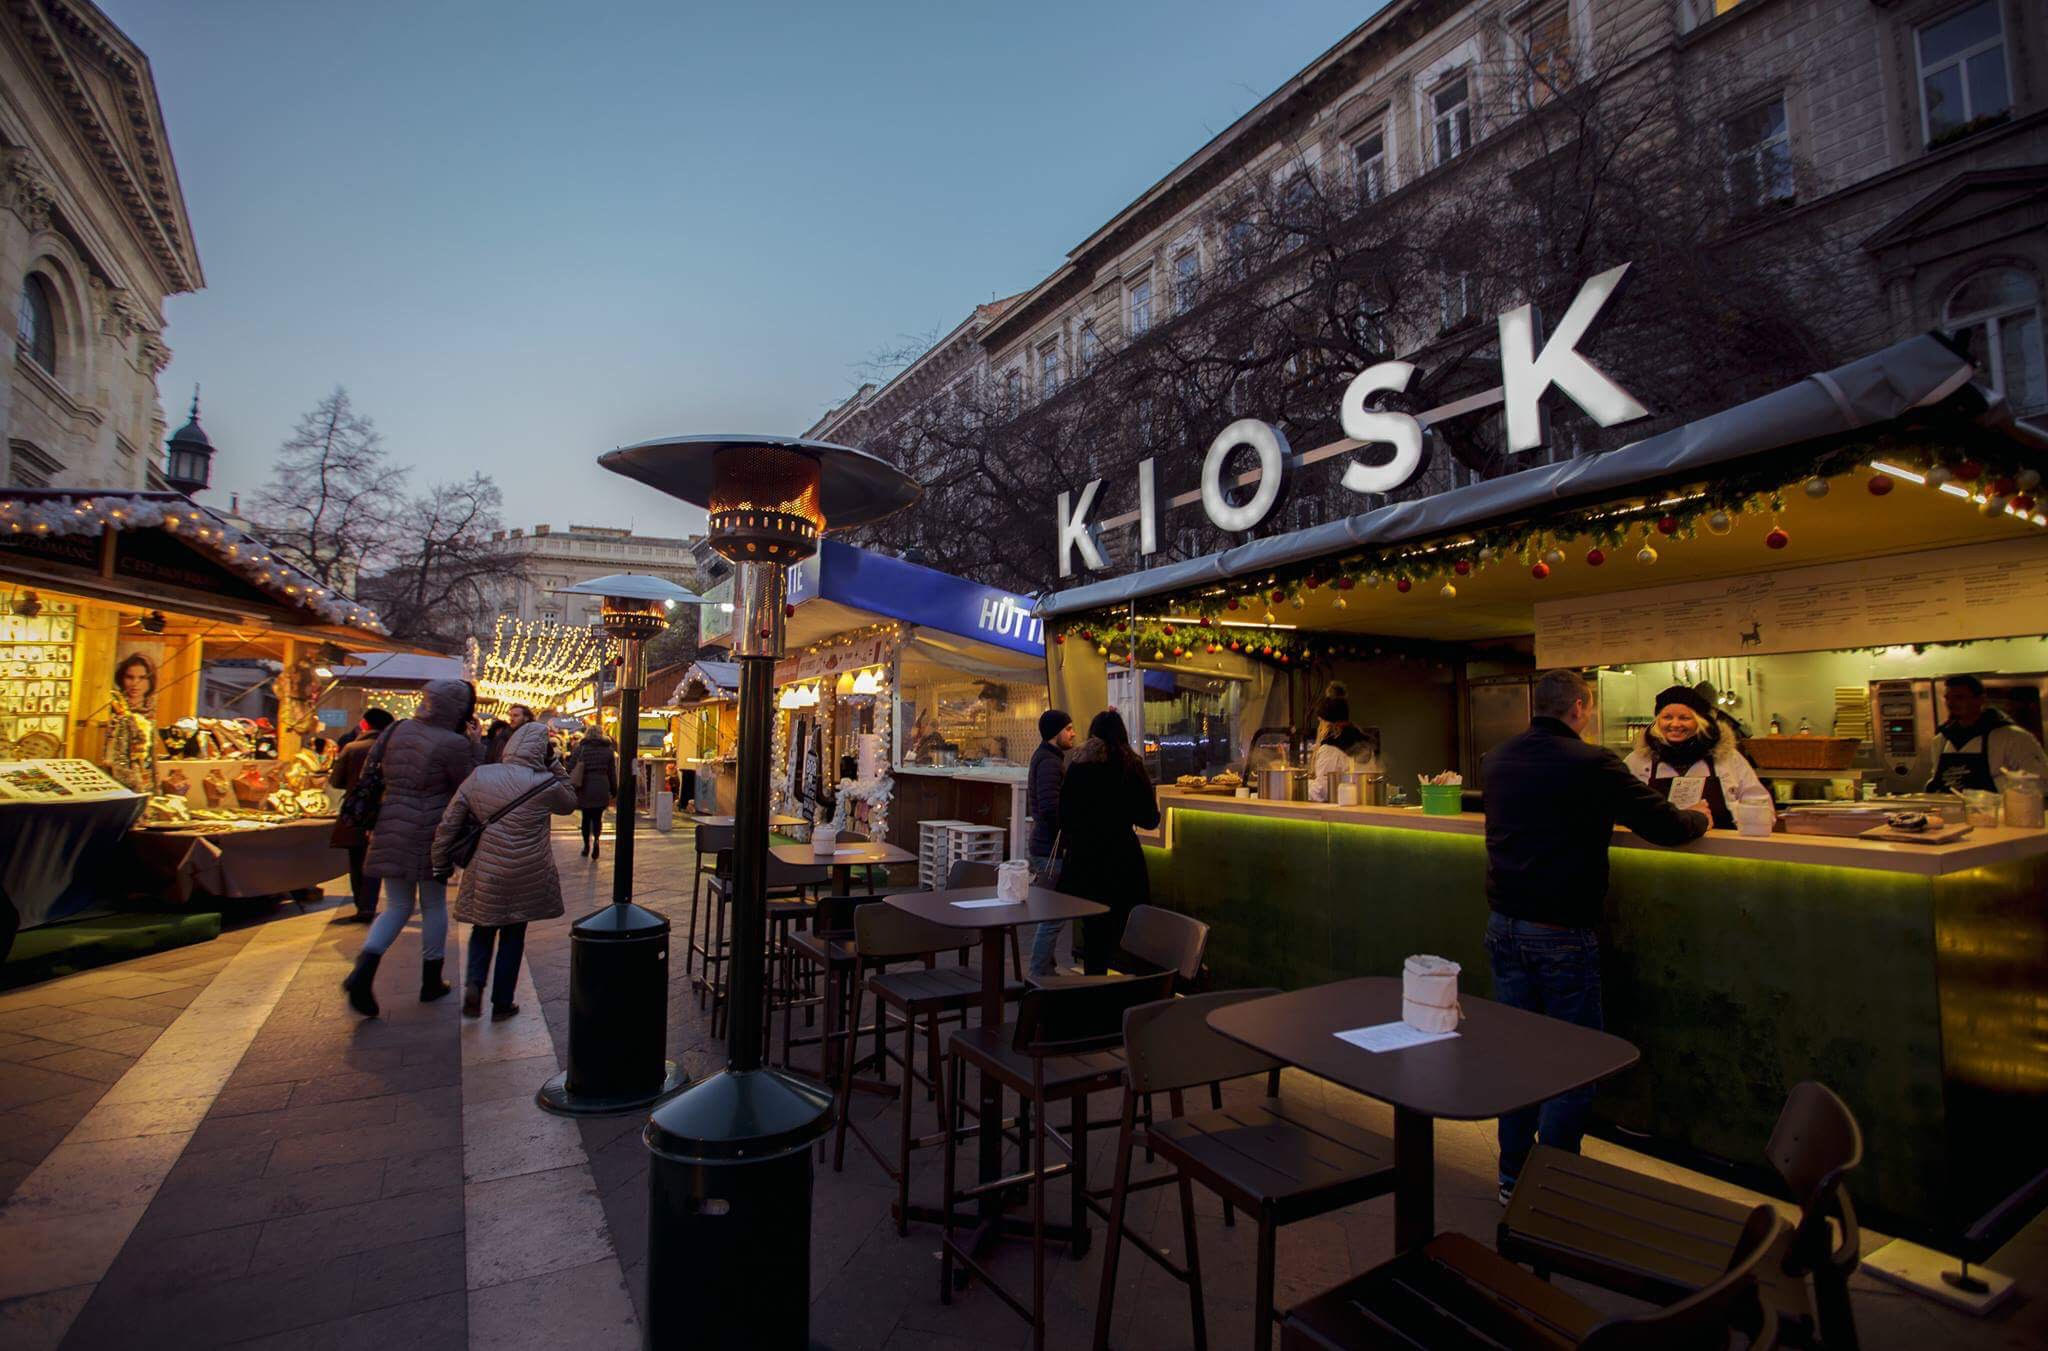 kiosk_advent_kintrol.jpg